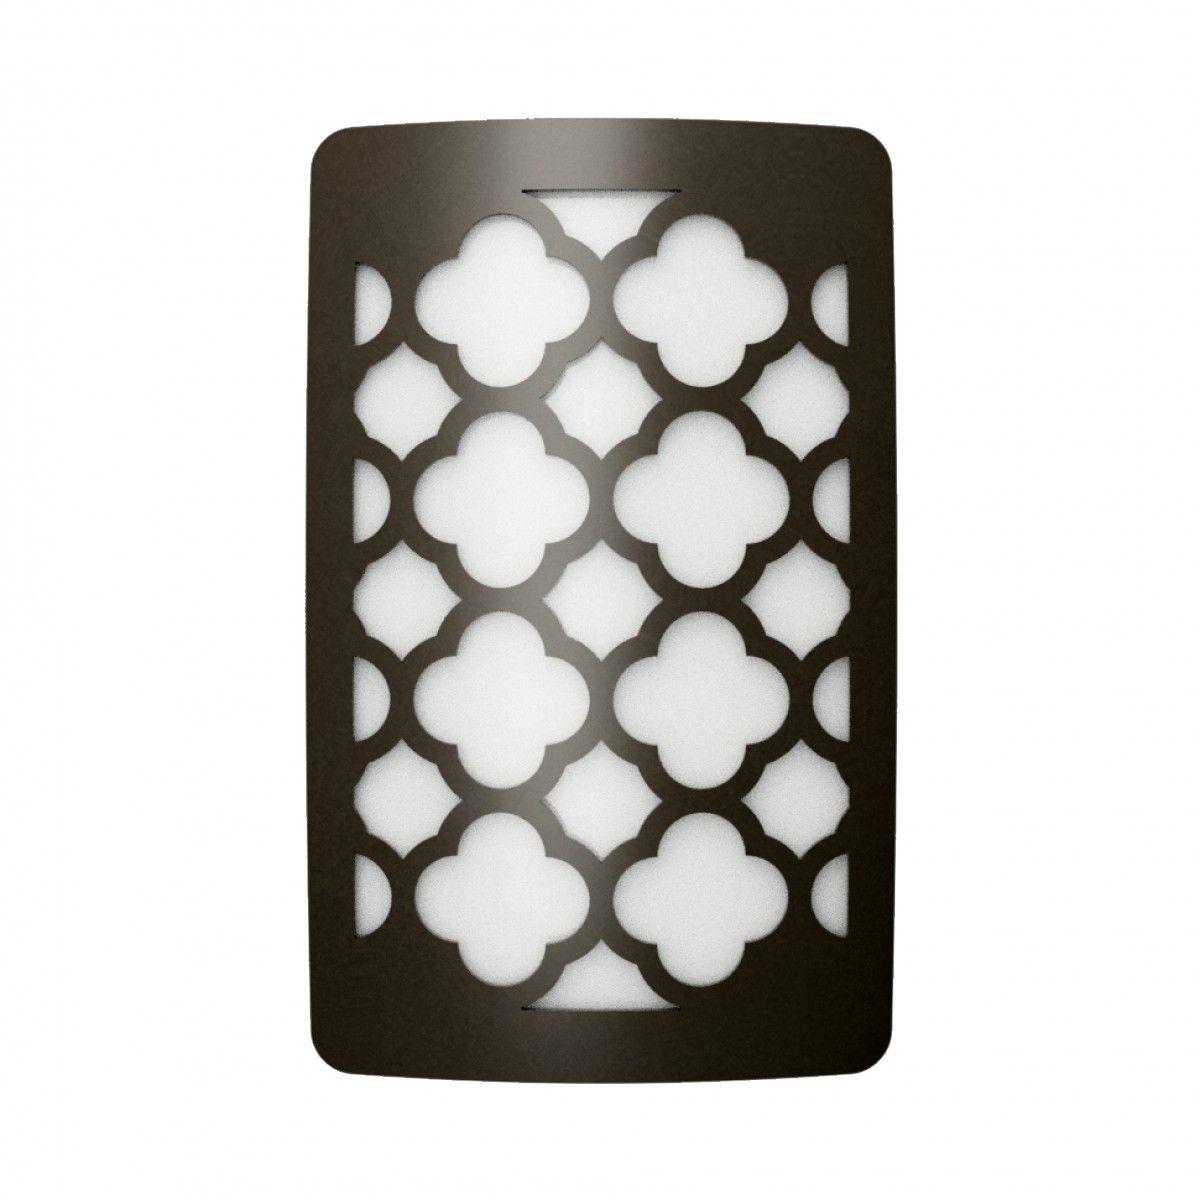 Westek Dark Bronze Decorative Led Night Light With Auto Dusk To Dawn Sensor Led Night Light Night Light Dusk To Dawn